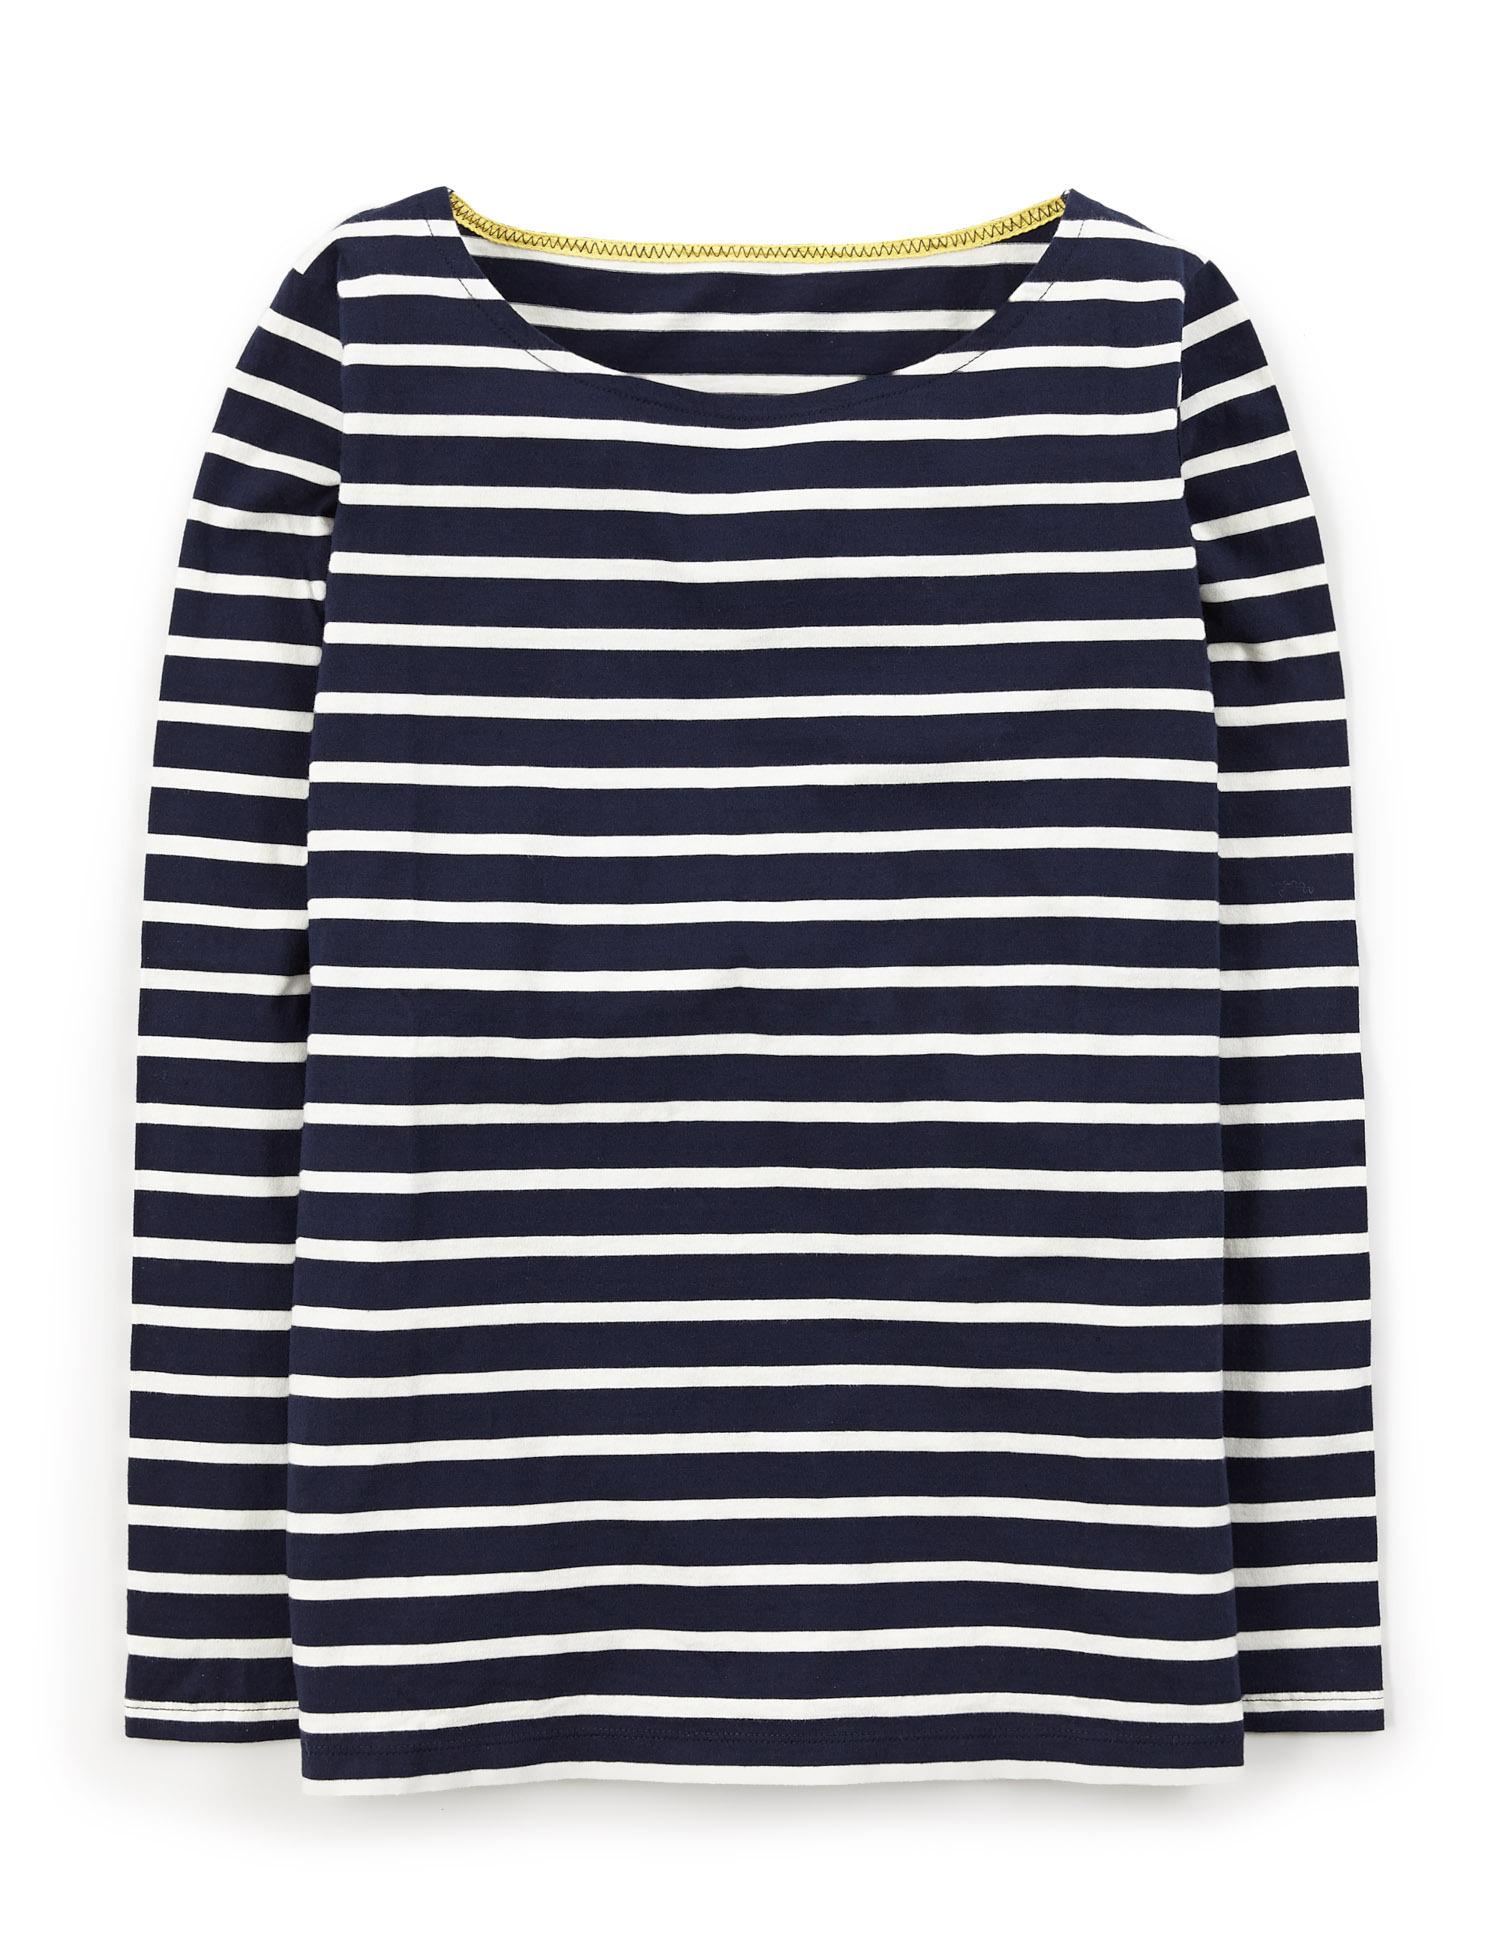 Long Sleeve Breton (Ivory/Navy)